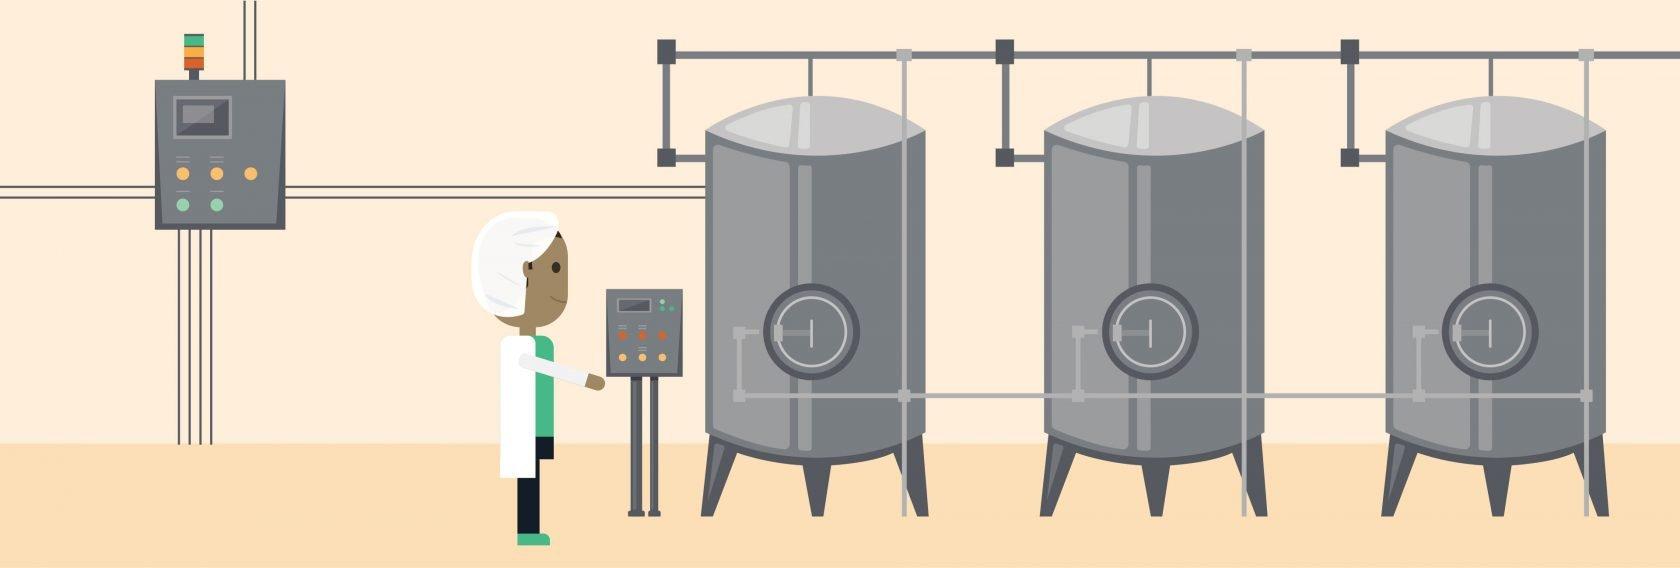 Illustration of dairy processing tanks